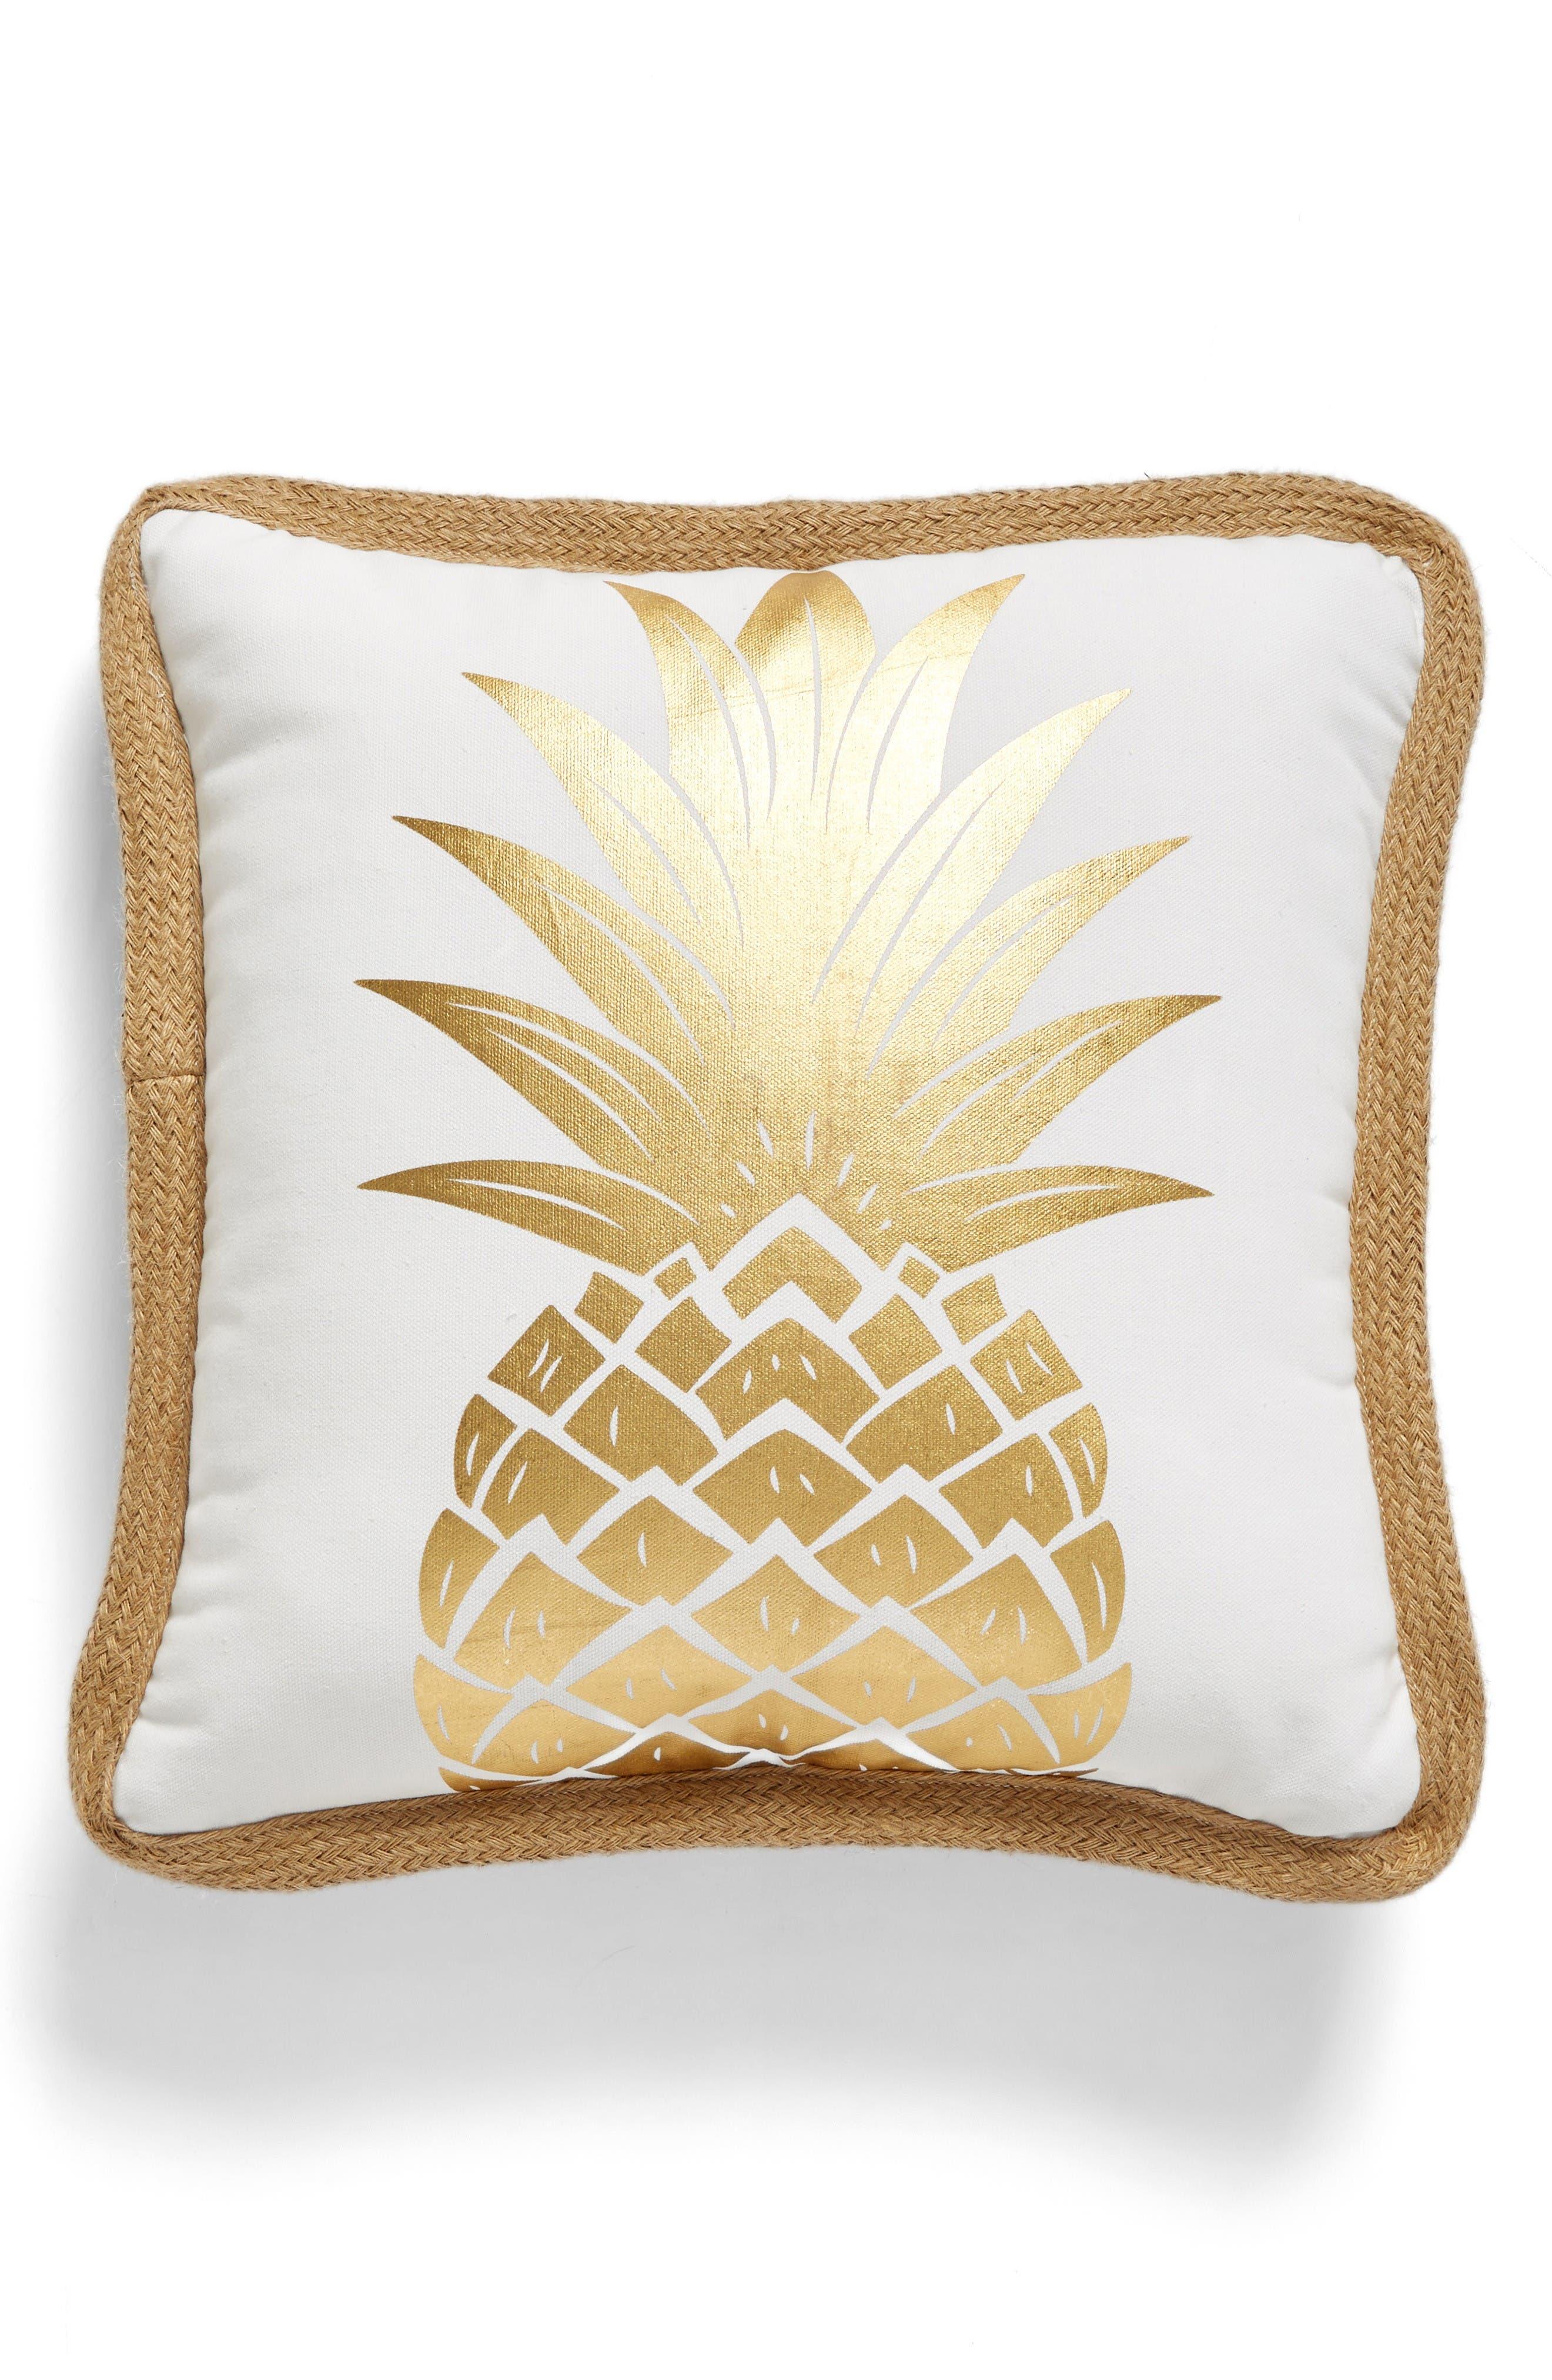 Alternate Image 1 Selected - Levtex Pineapple Pillow